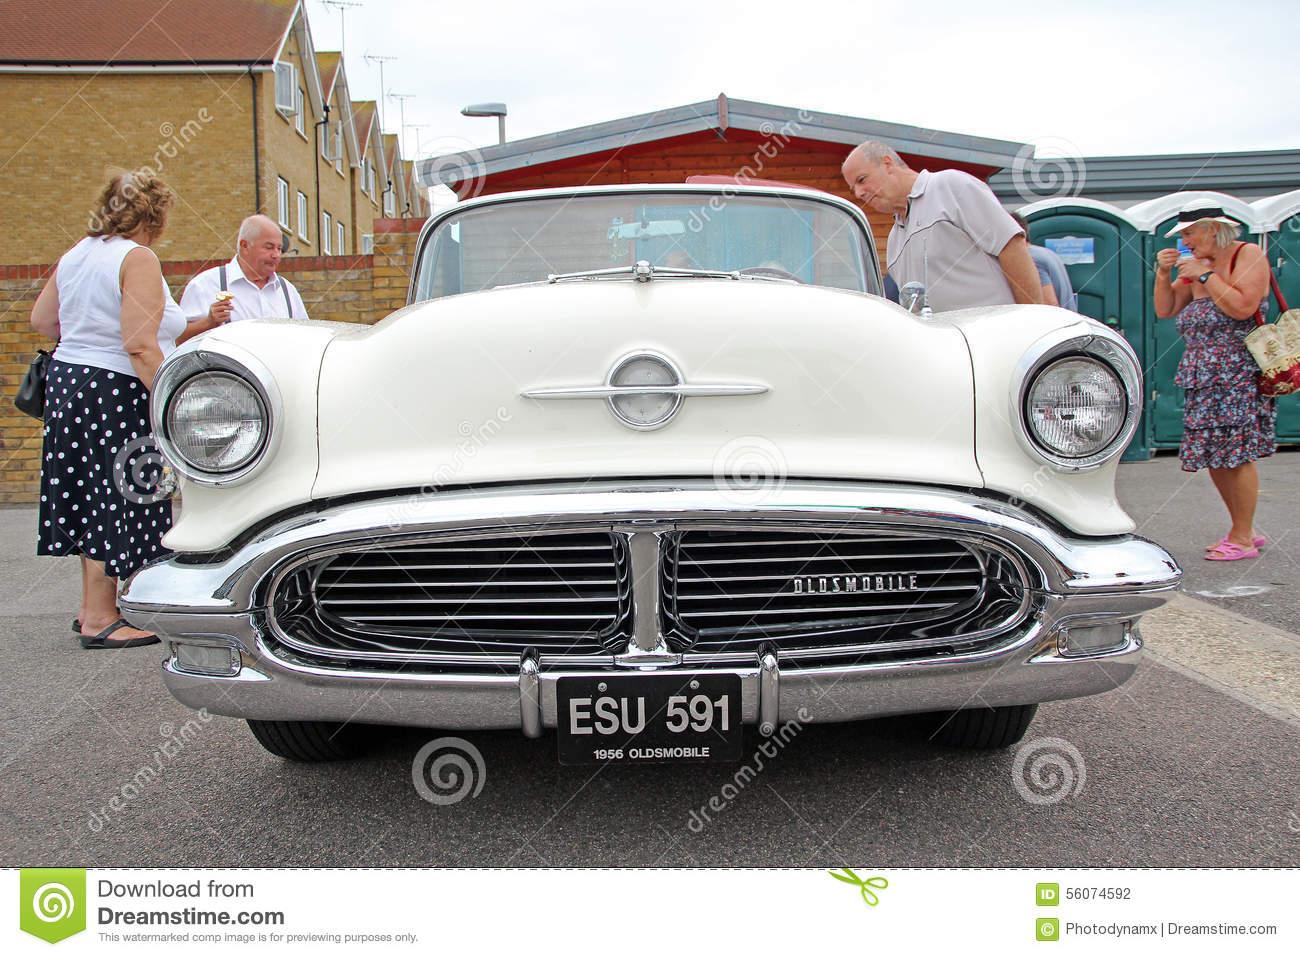 Oldsmobile clipart.